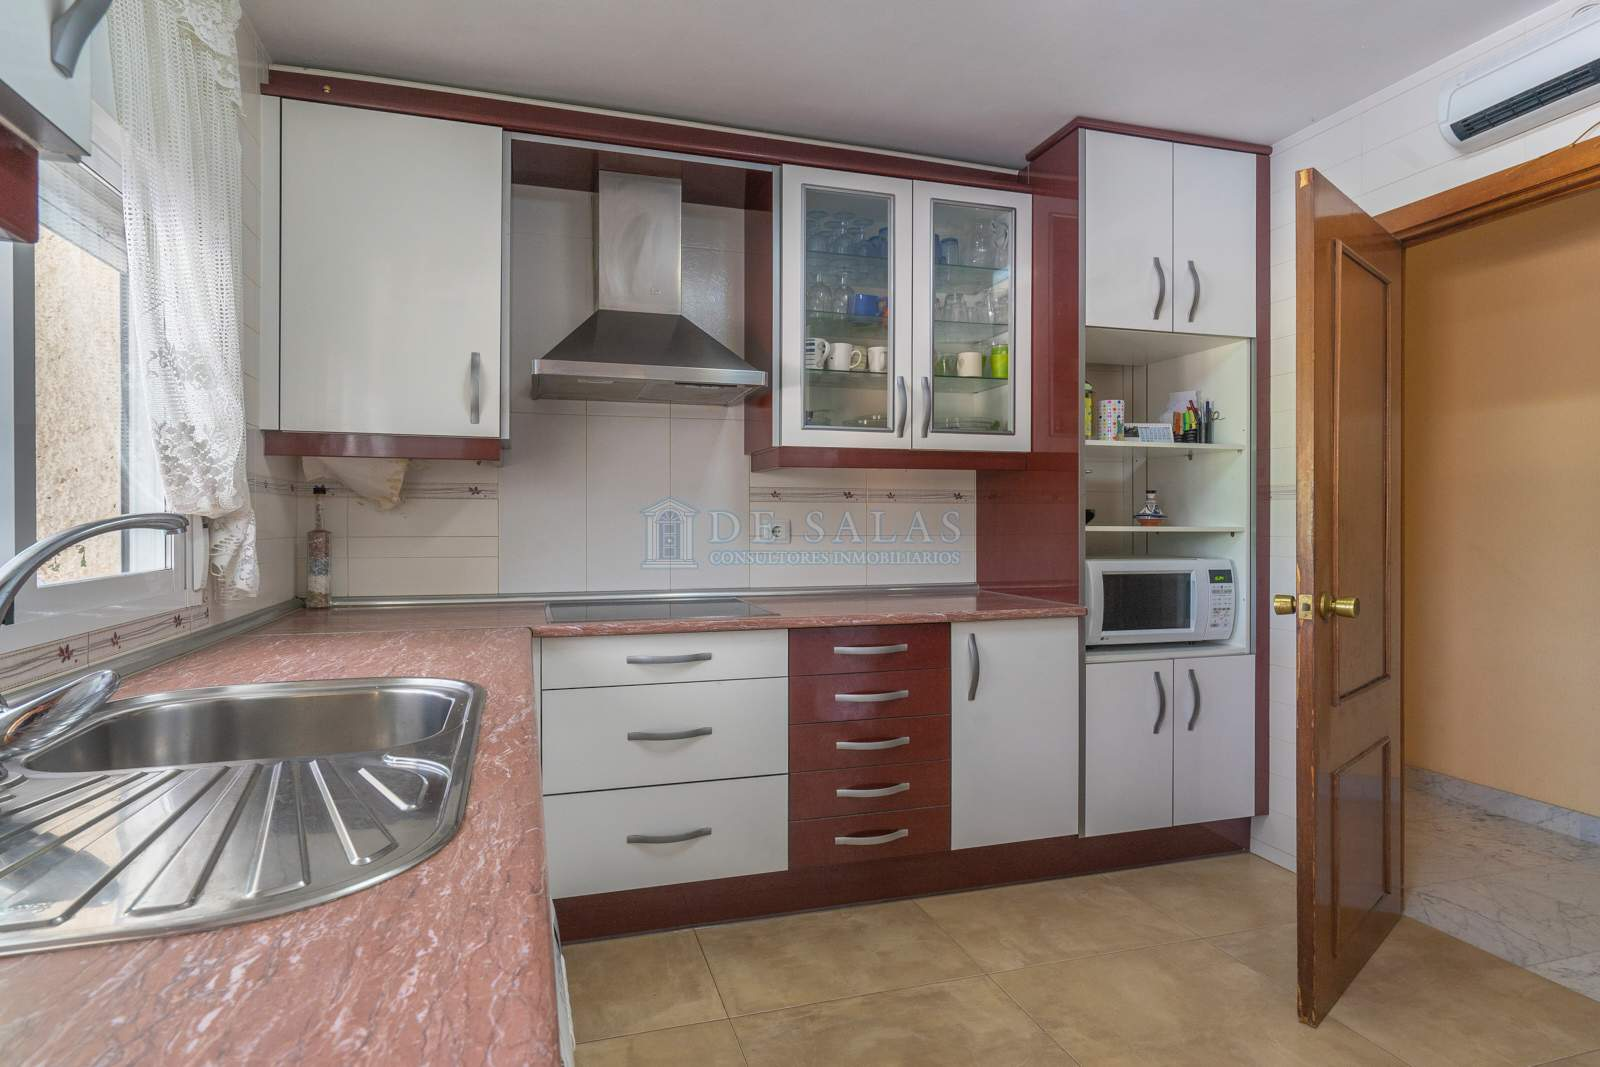 Cocina-27 House La Moraleja